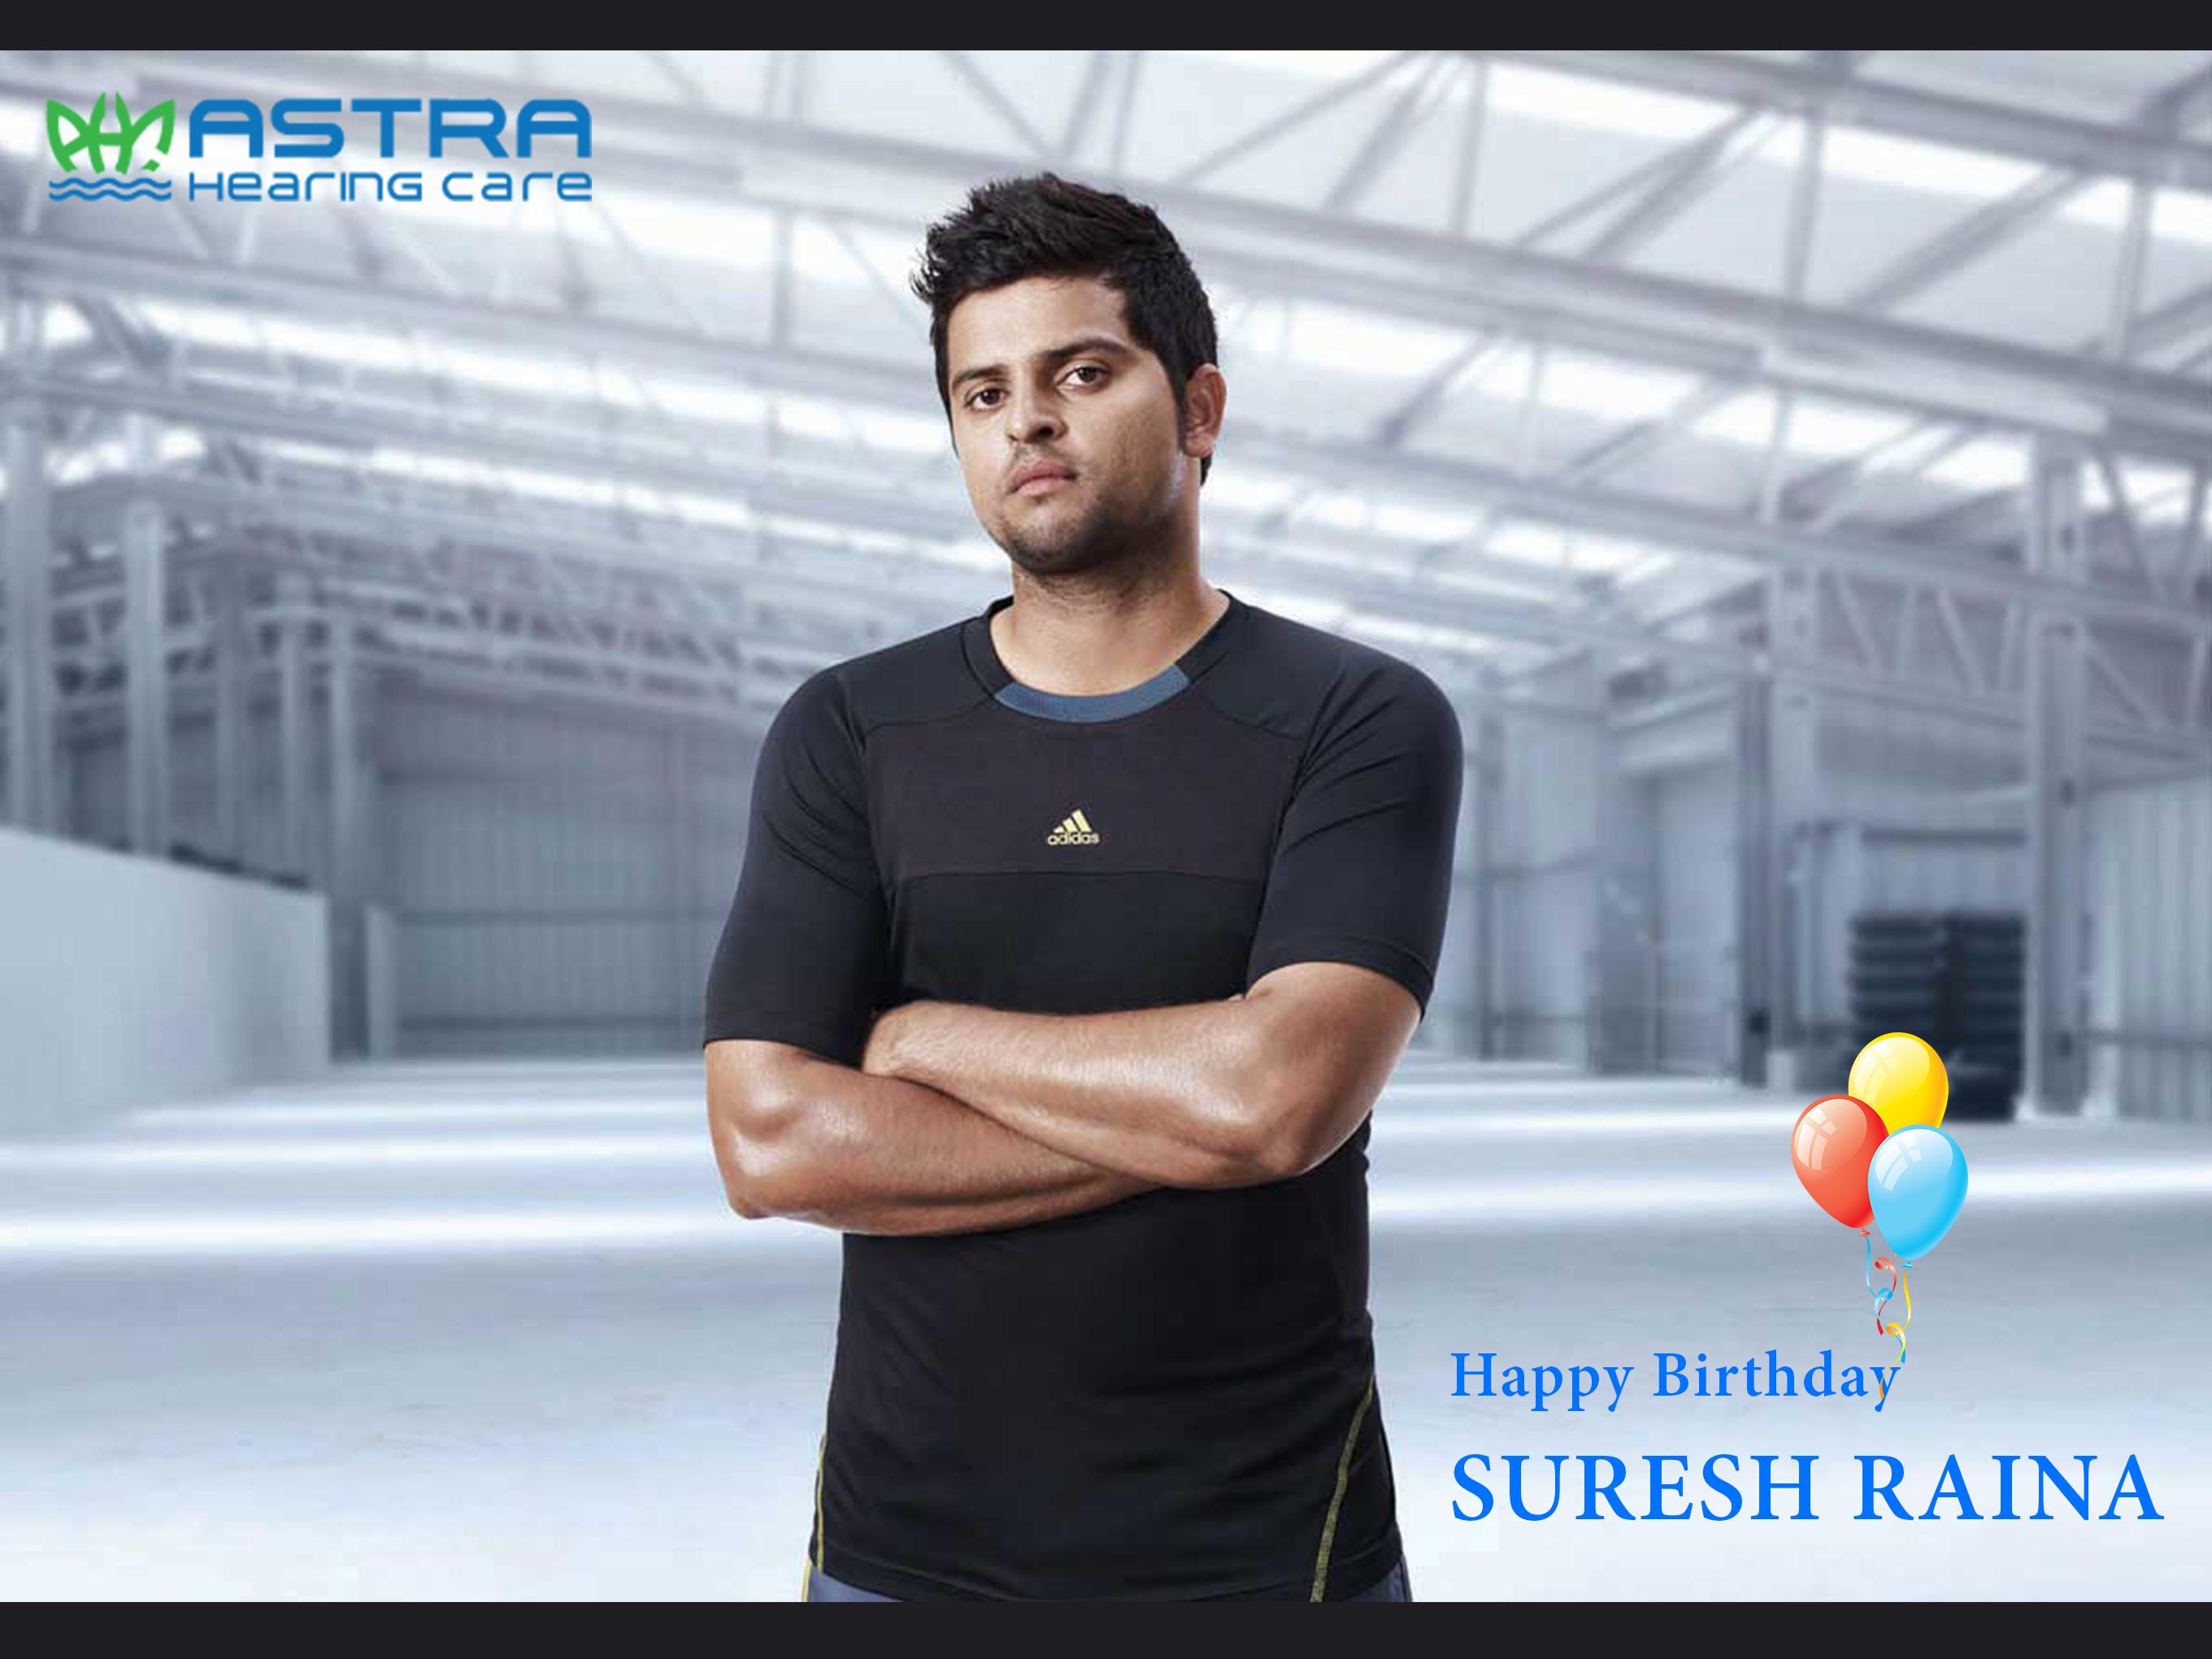 Astra Hearing Care wishes cricket star Suresh Raina a very